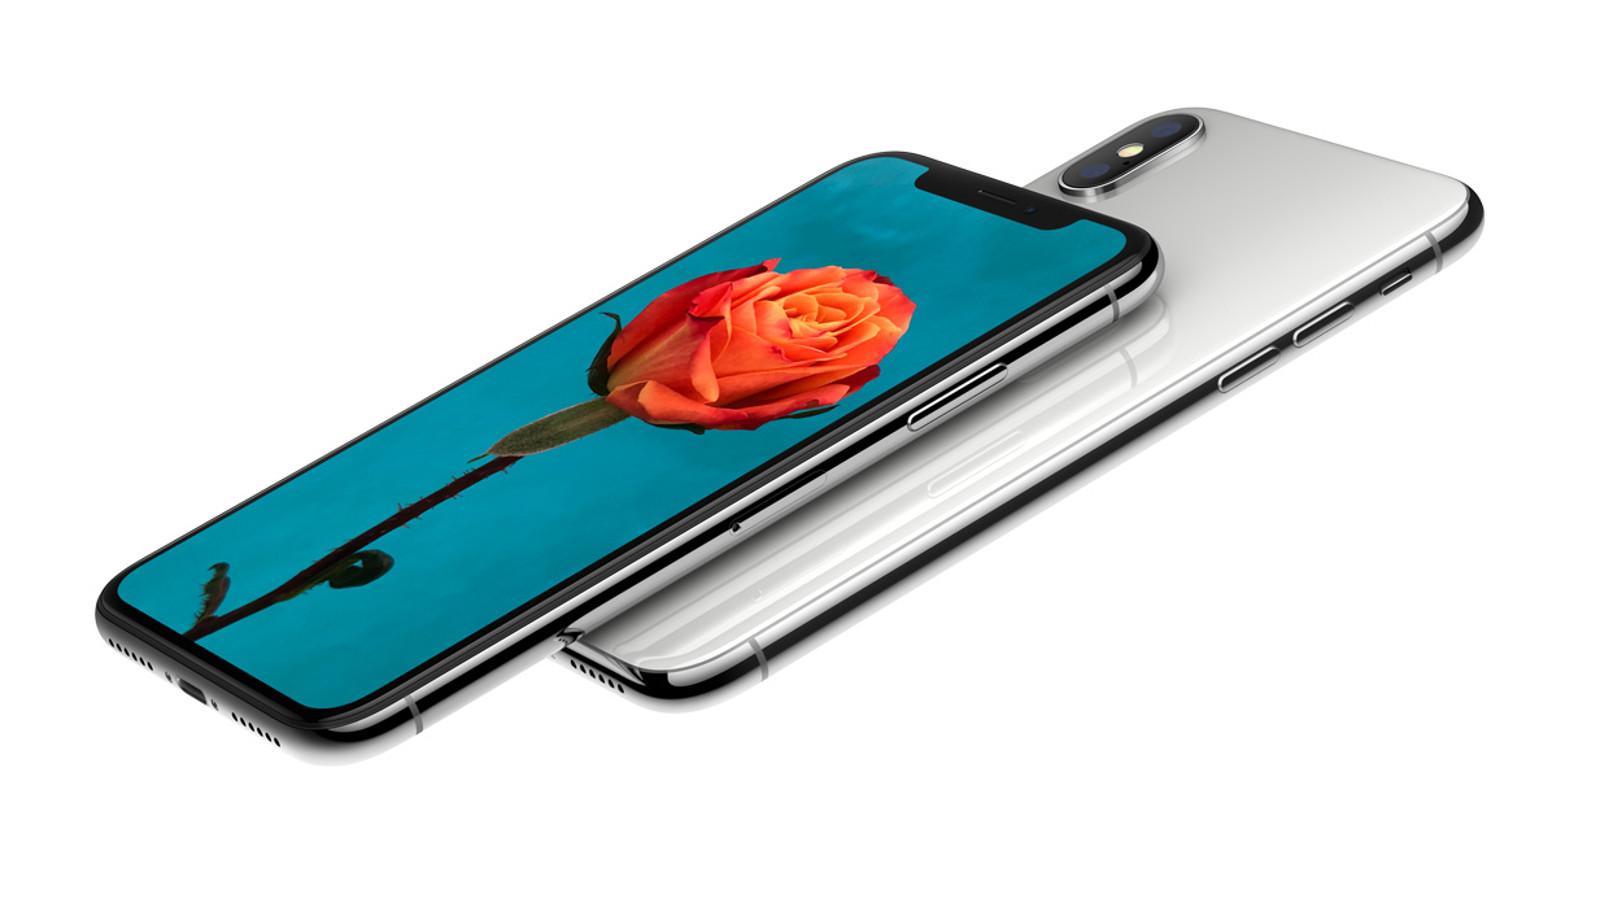 iphone,iphone x